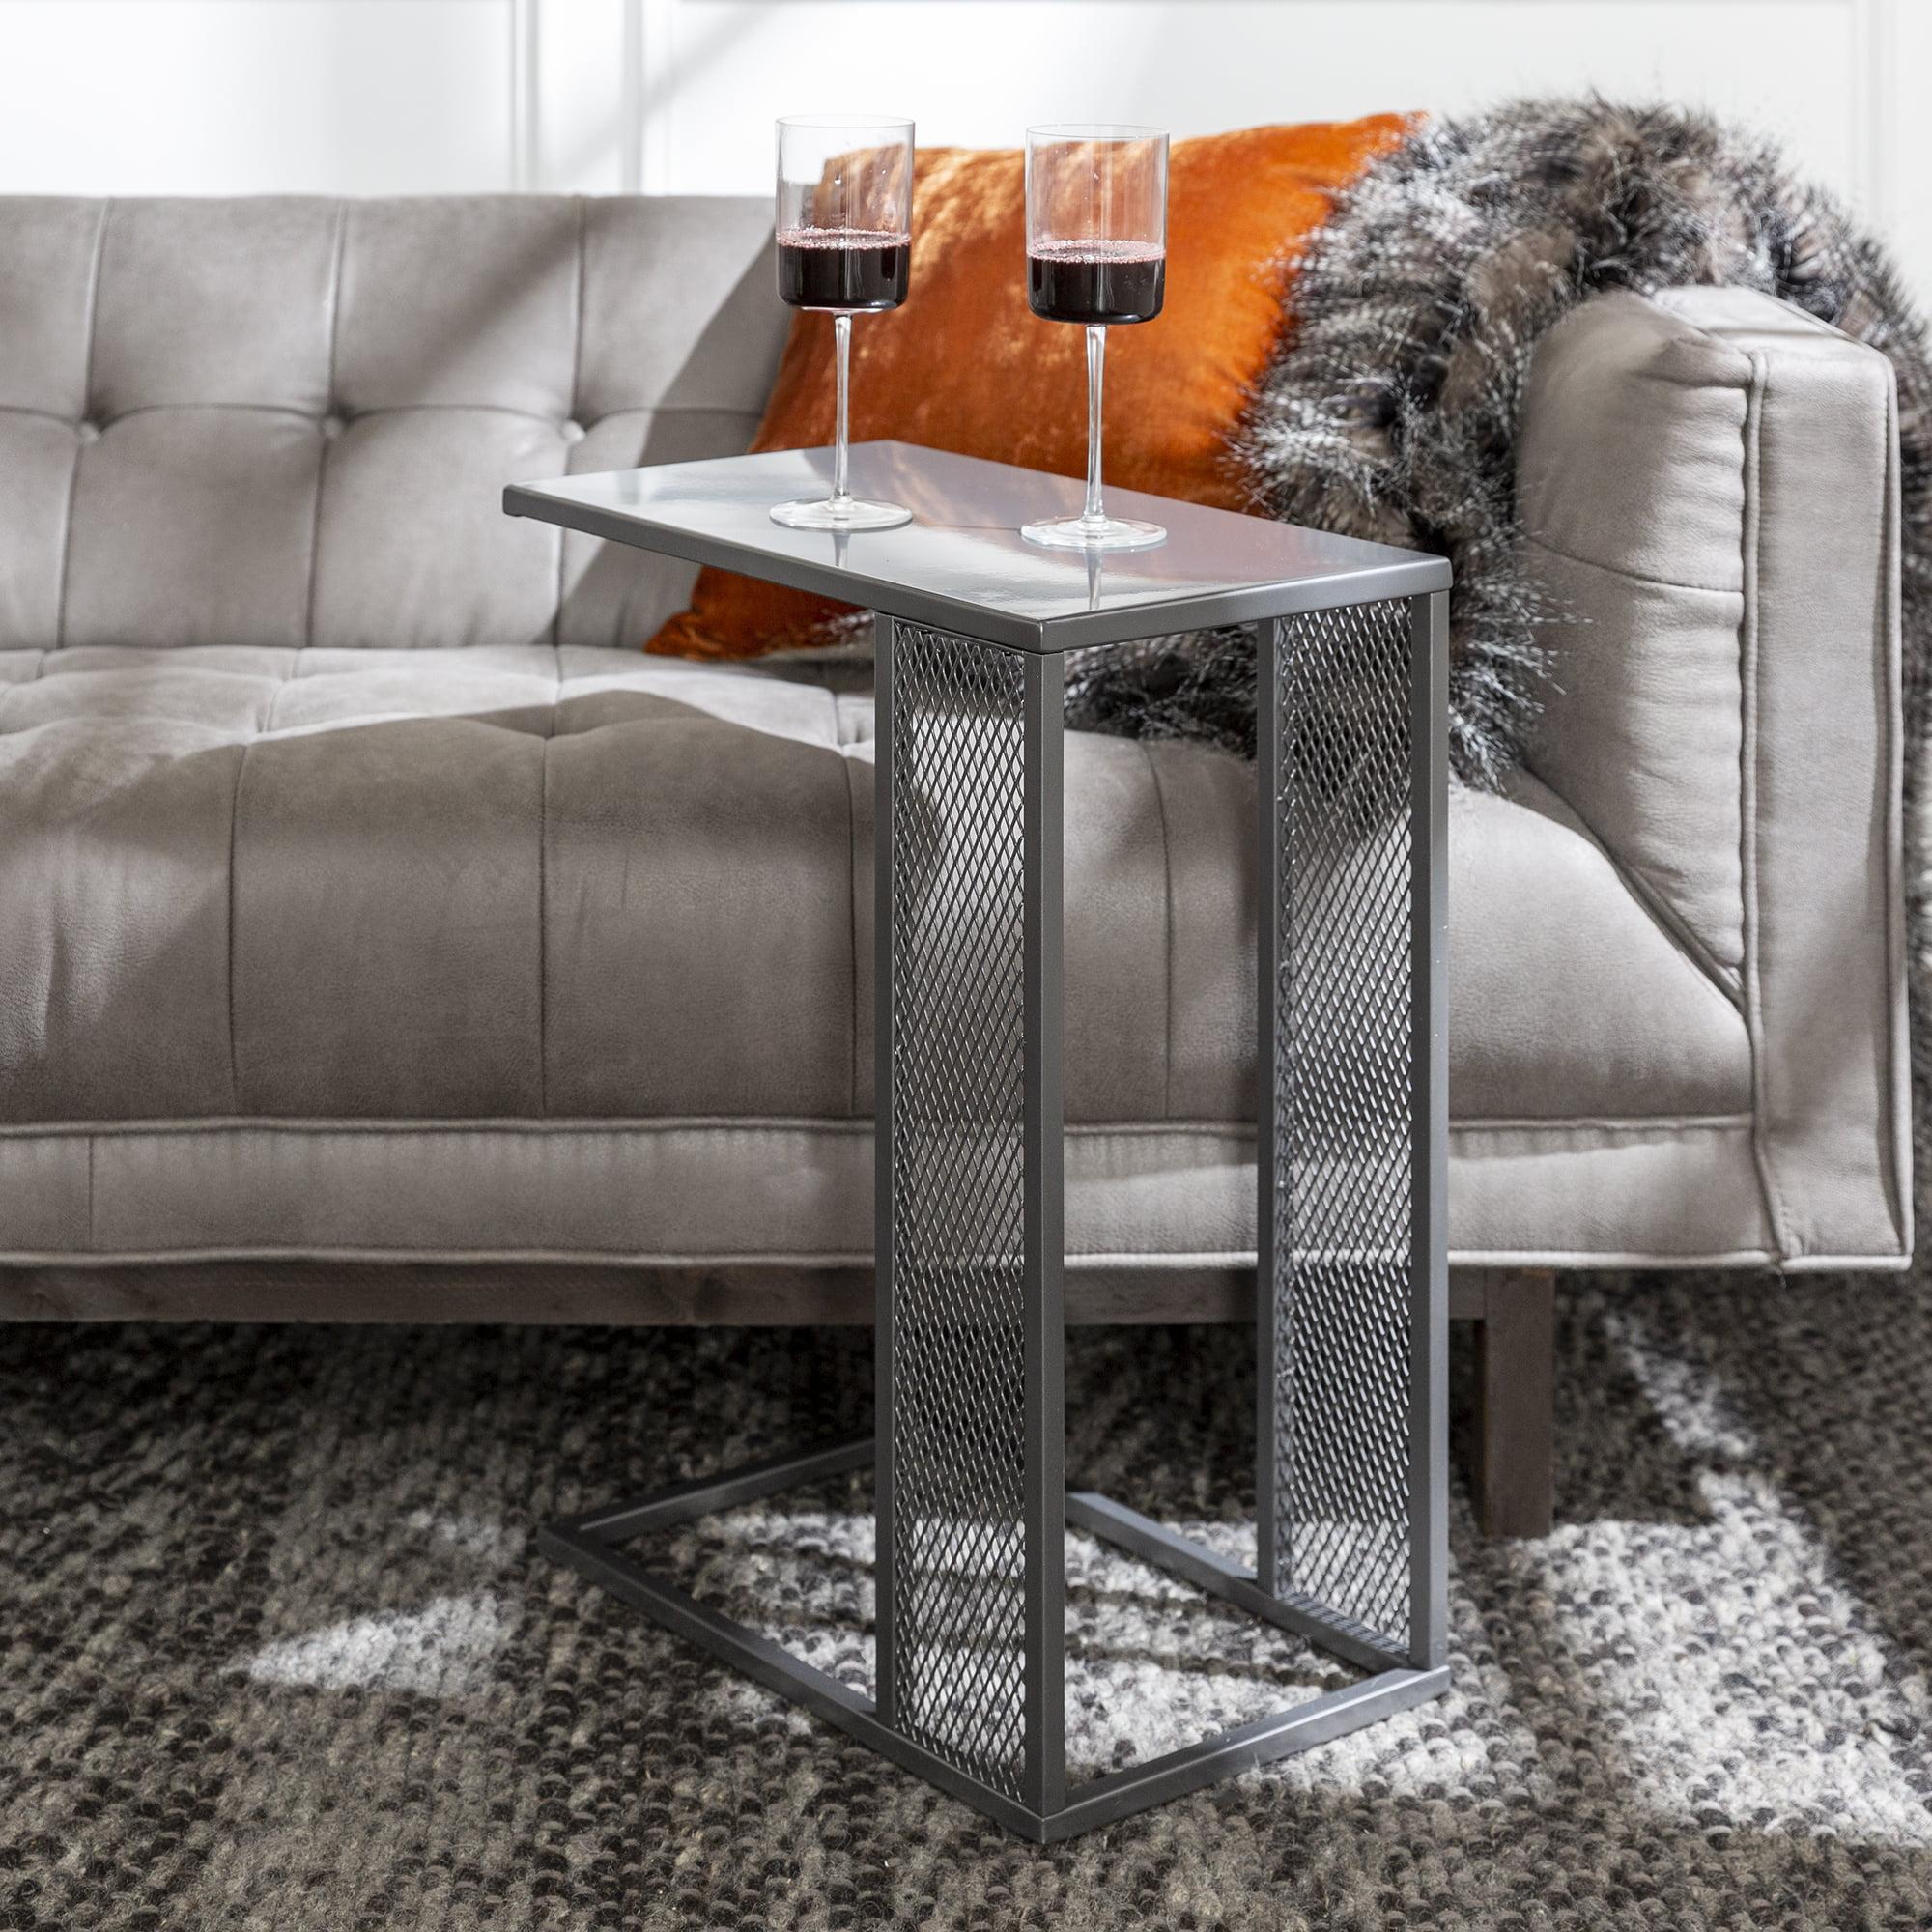 Brigham Mesh Metal C-Table by River Street Designs